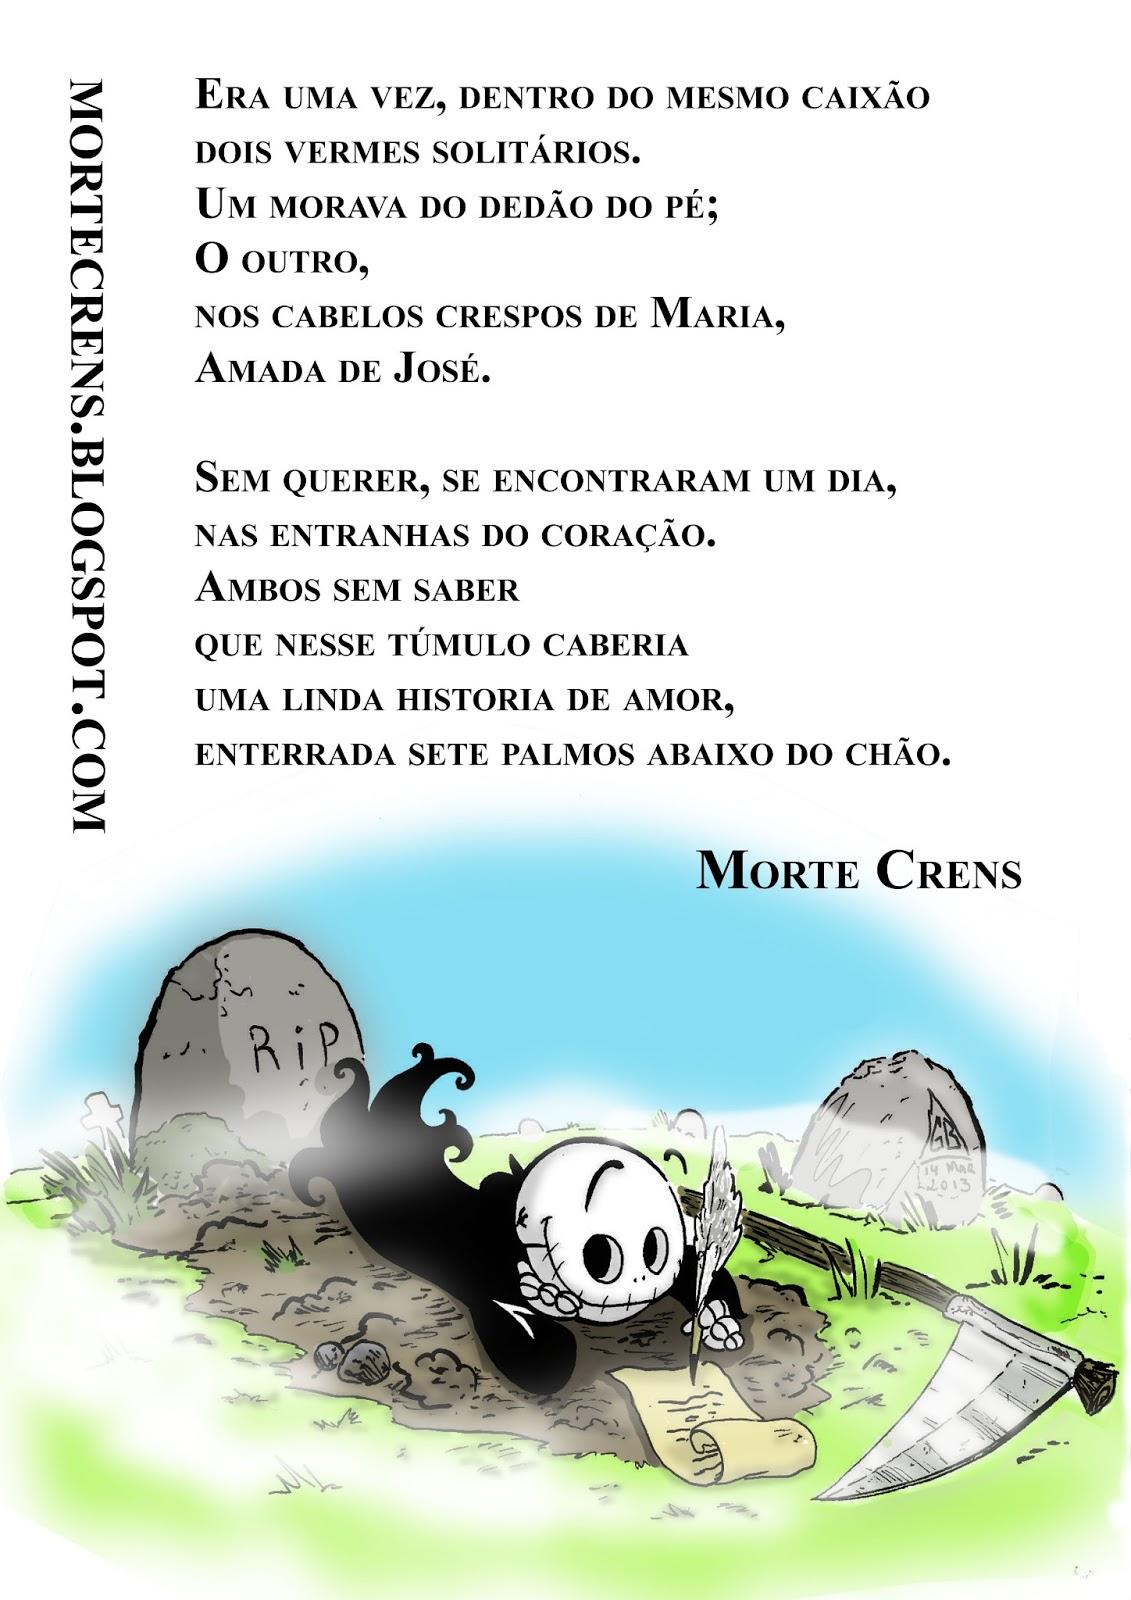 Poema Morte Crens A Entediante Vida De Morte Crens